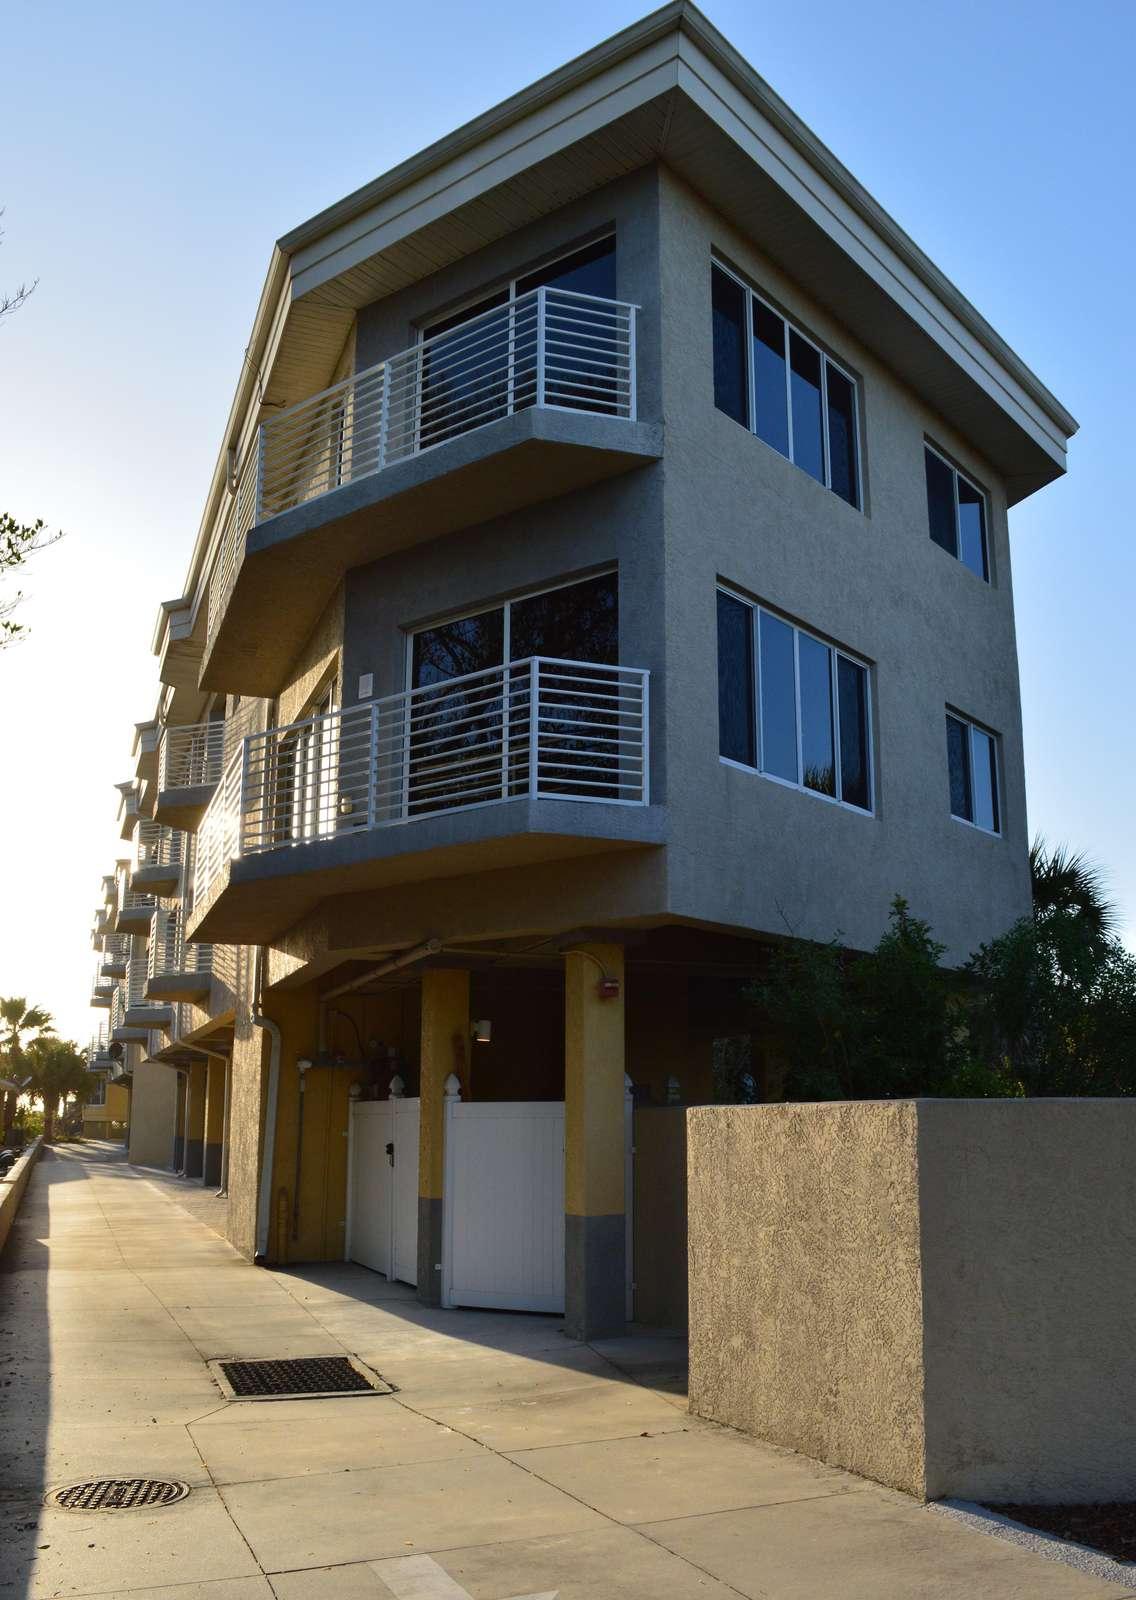 Englewood Beach Condo C | Englewood Beach Vacation Rentals